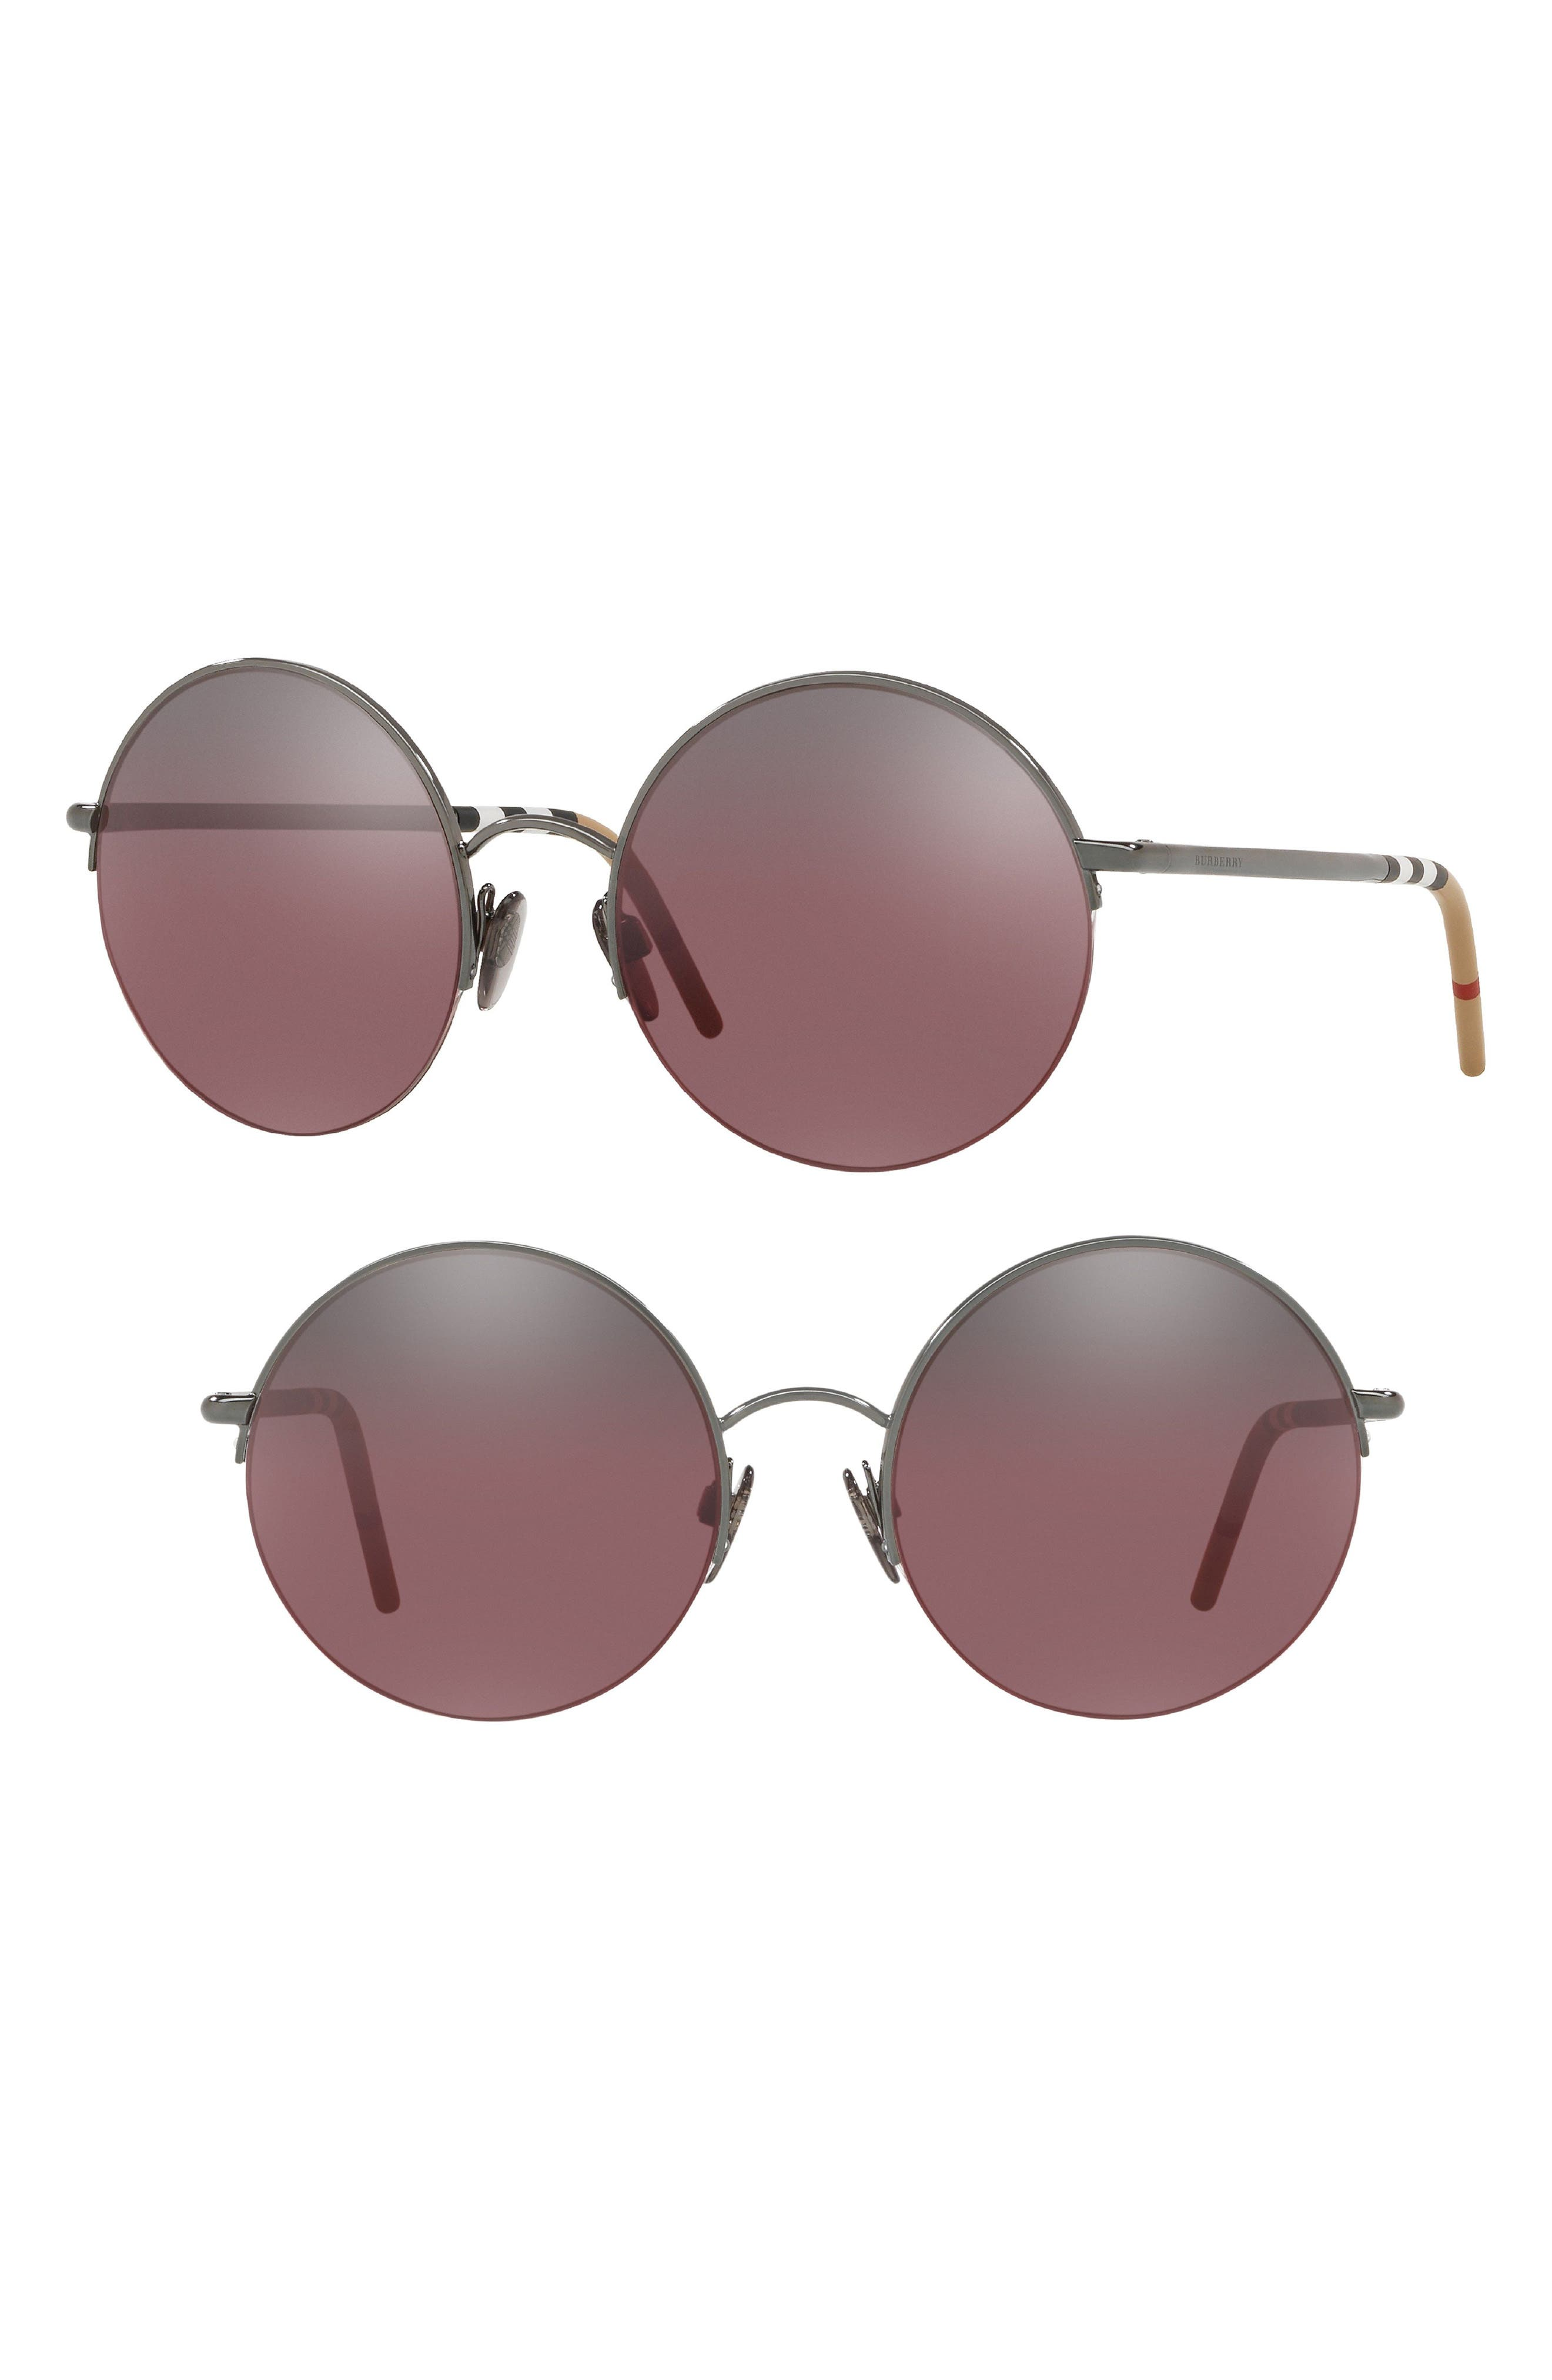 54mm Round Sunglasses,                             Alternate thumbnail 2, color,                             001